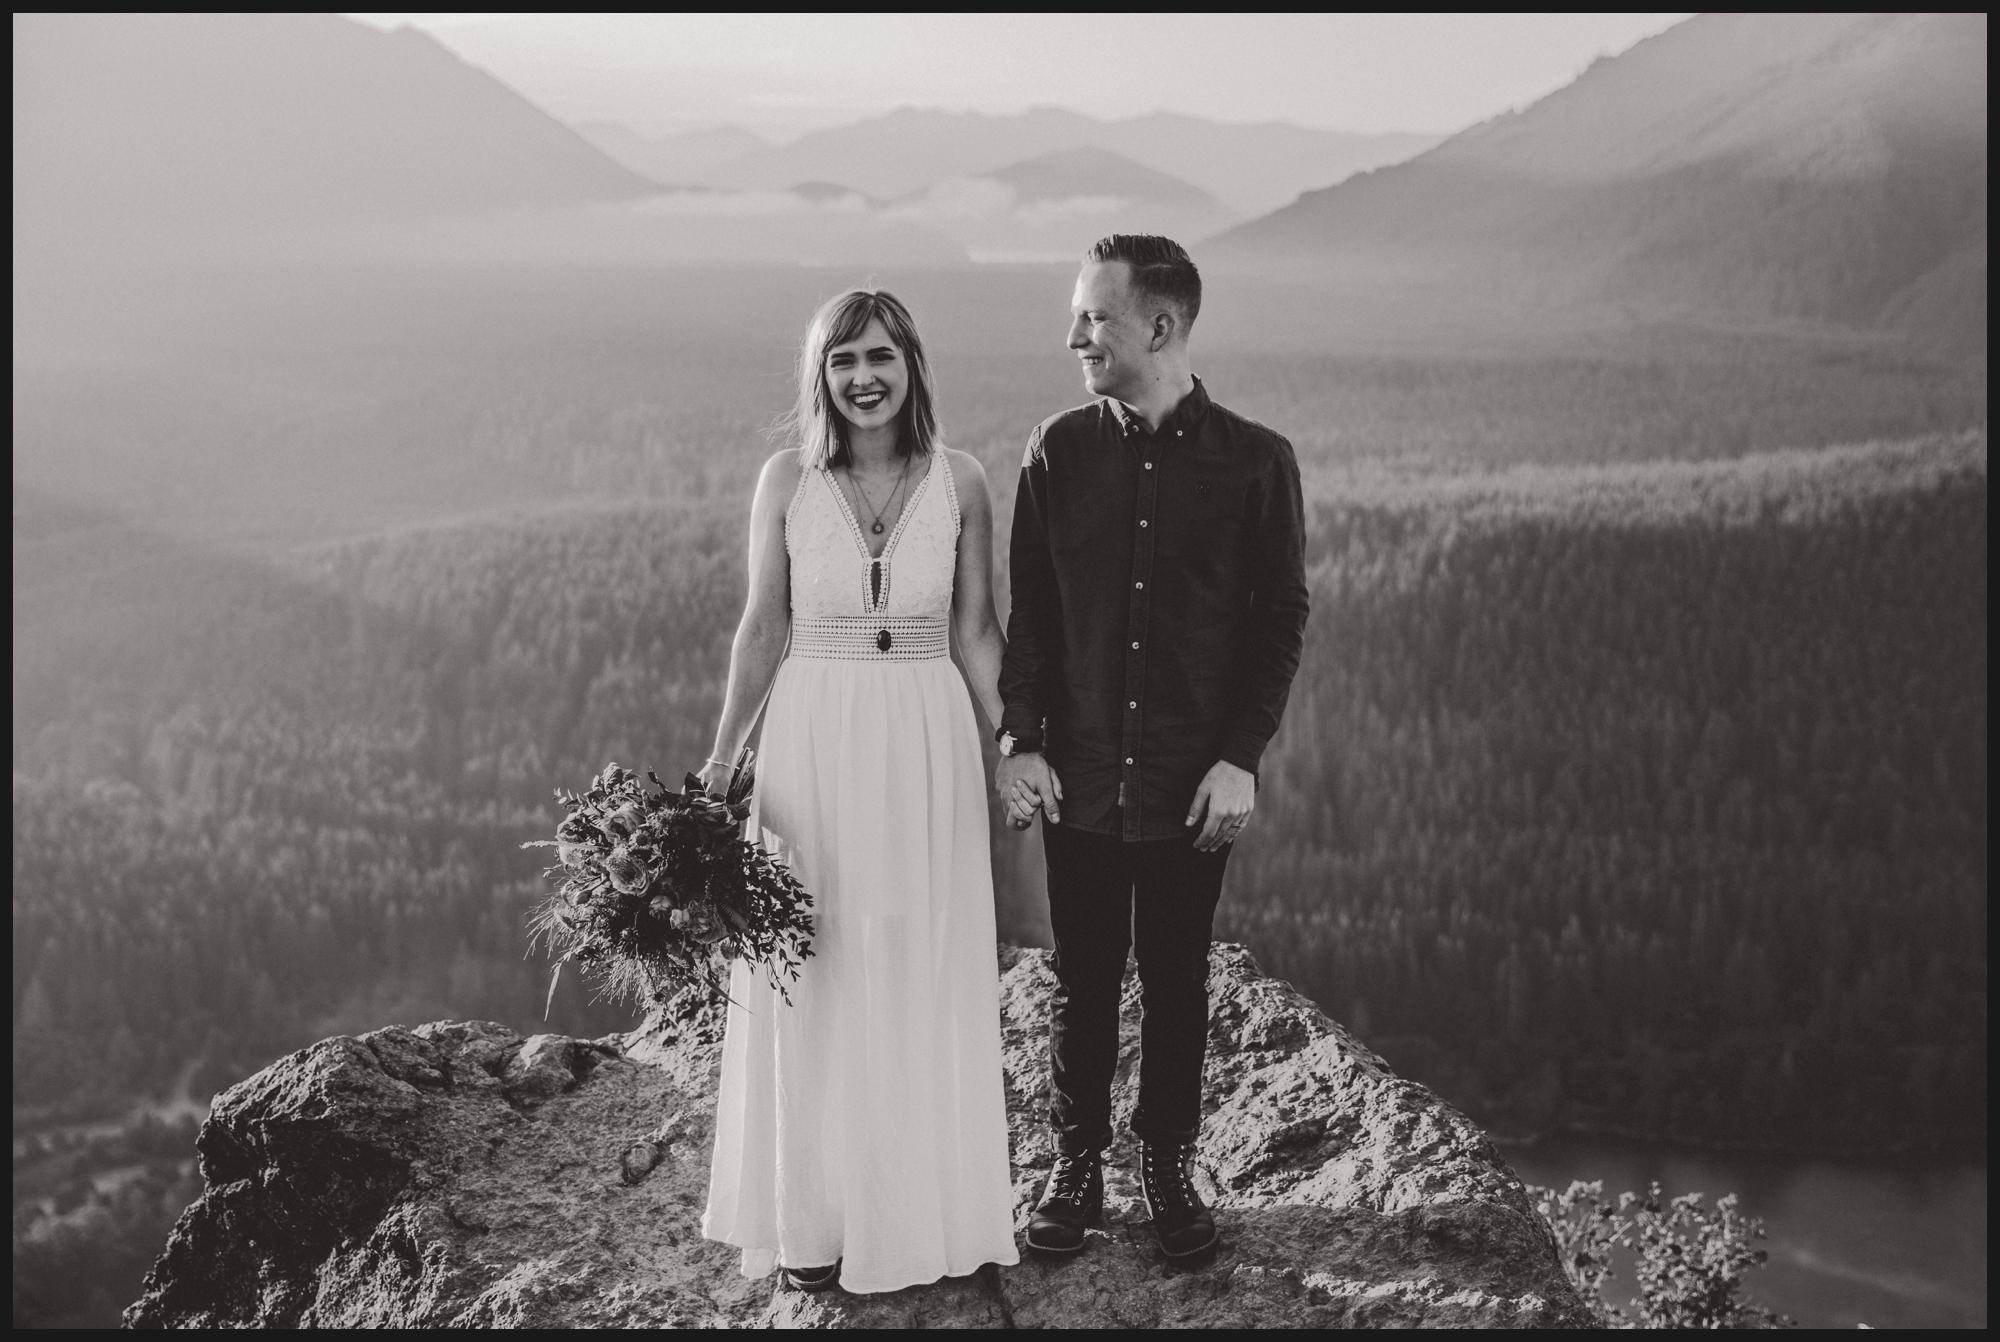 Orlando-Wedding-Photographer-destination-wedding-photographer-florida-wedding-photographer-bohemian-wedding-photographer_0434.jpg